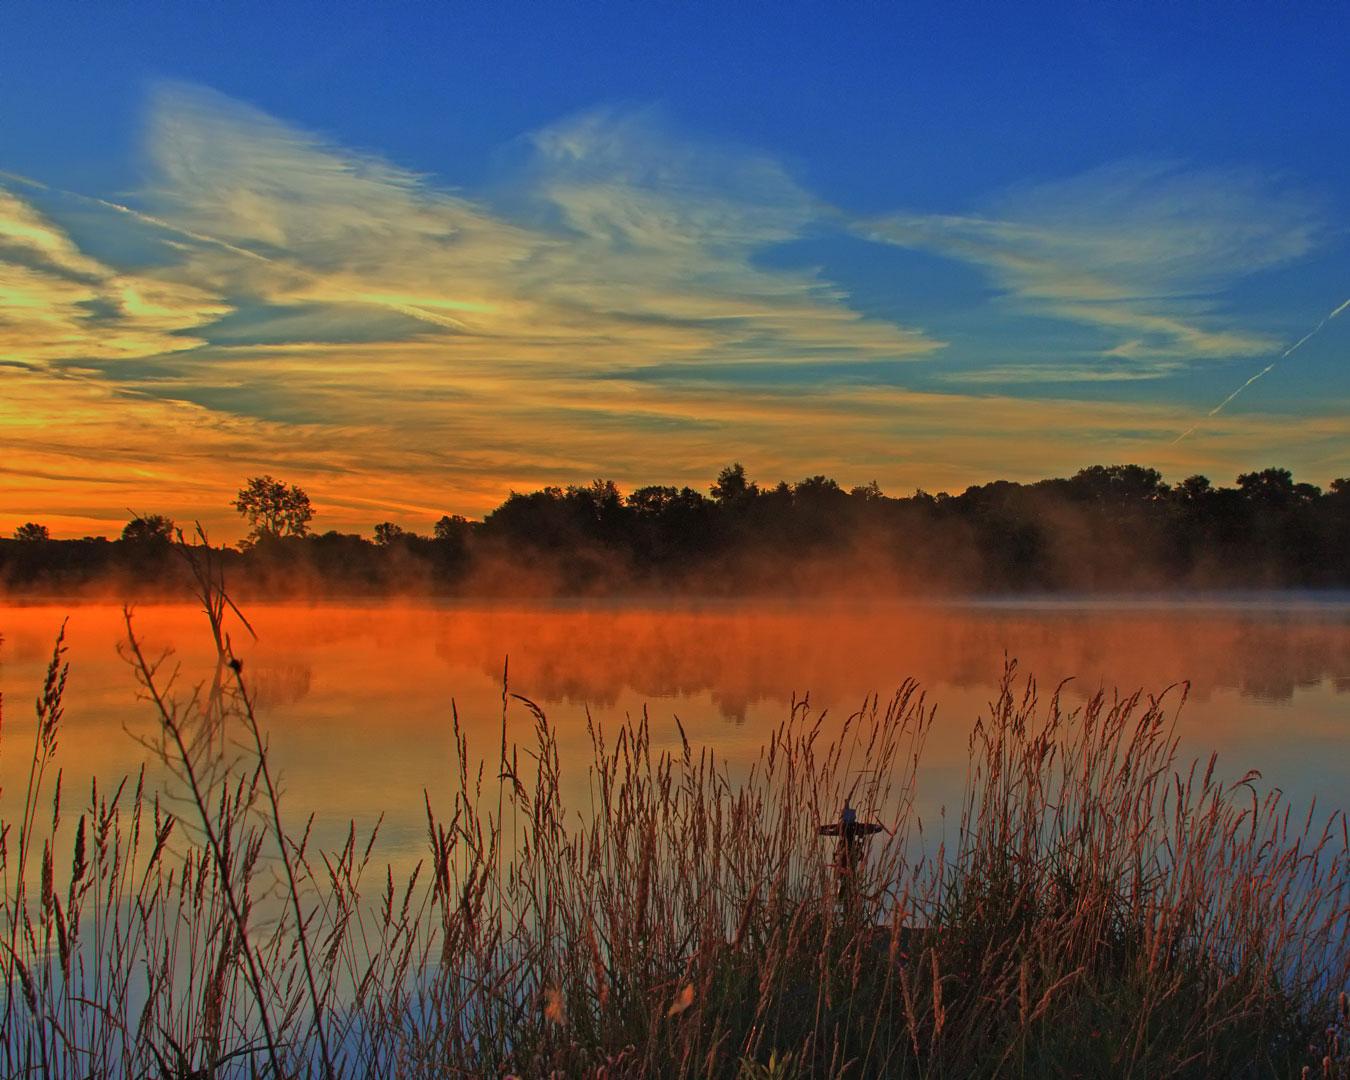 misty red sunrise over a large pond